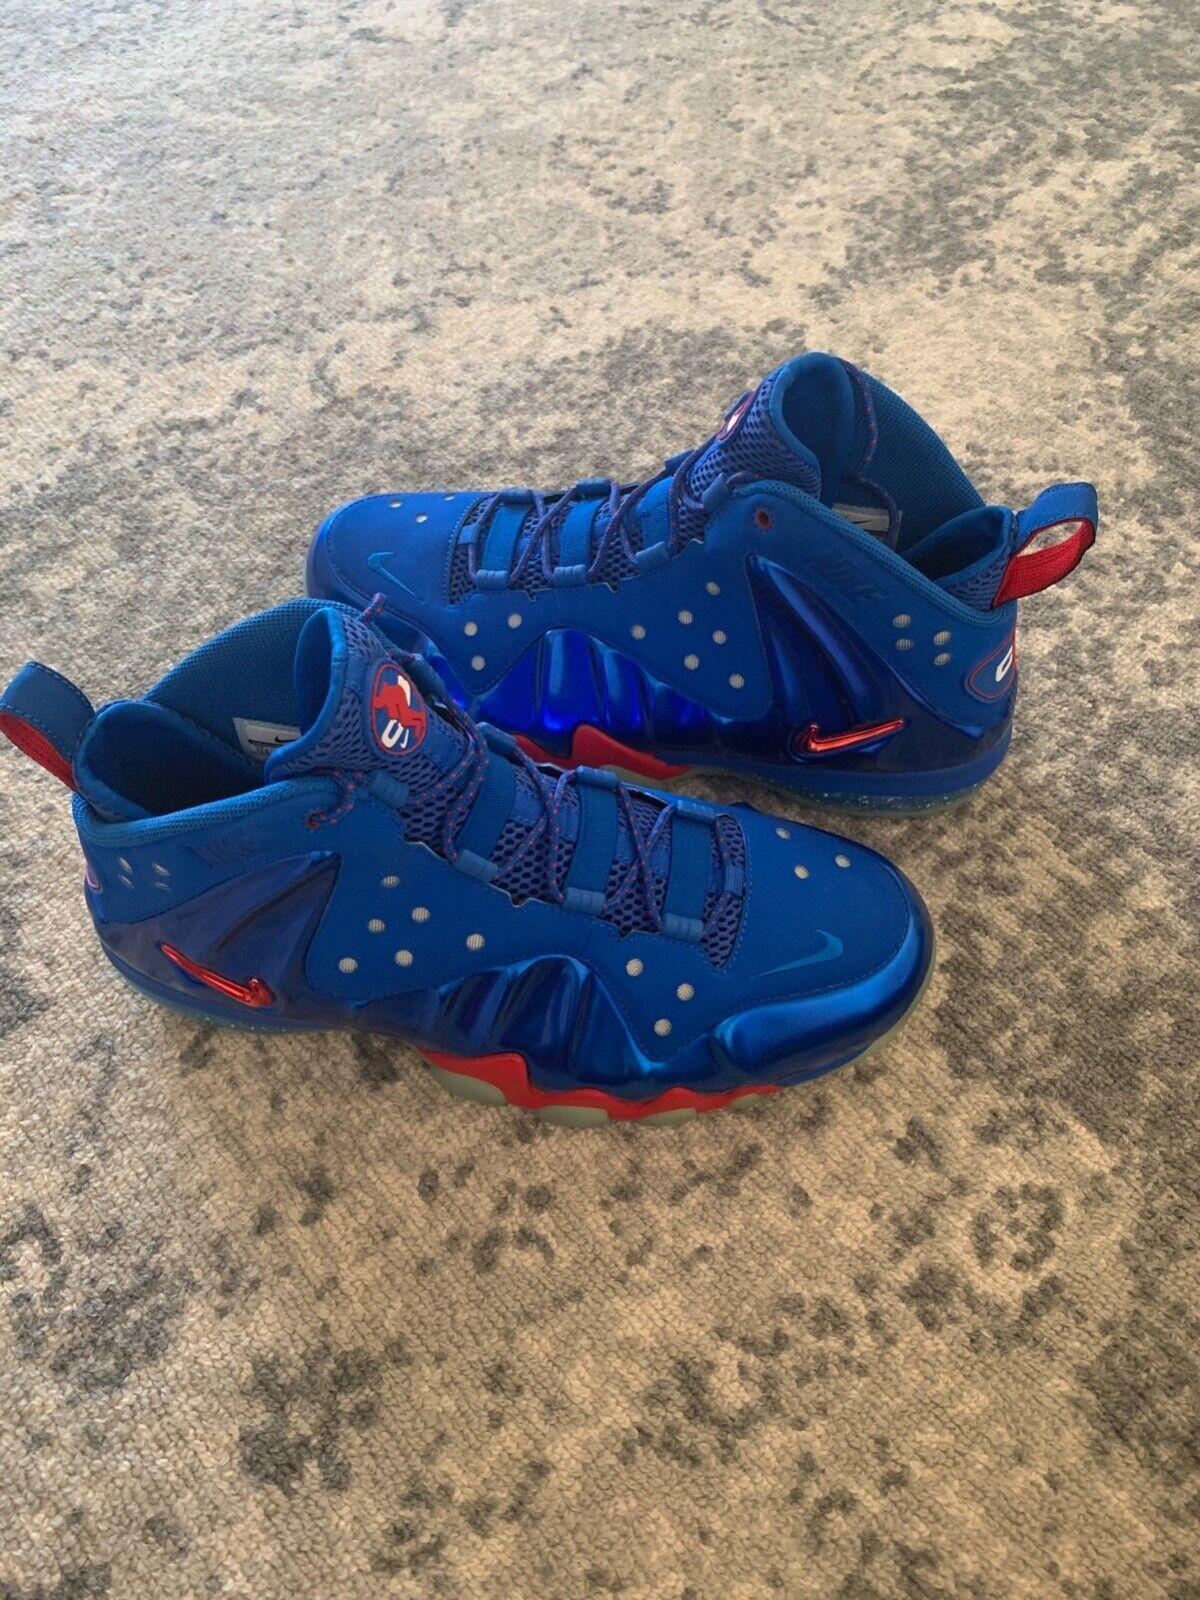 Brand new Nike Charles Barkley Men's shoes  size 11.5 bluee